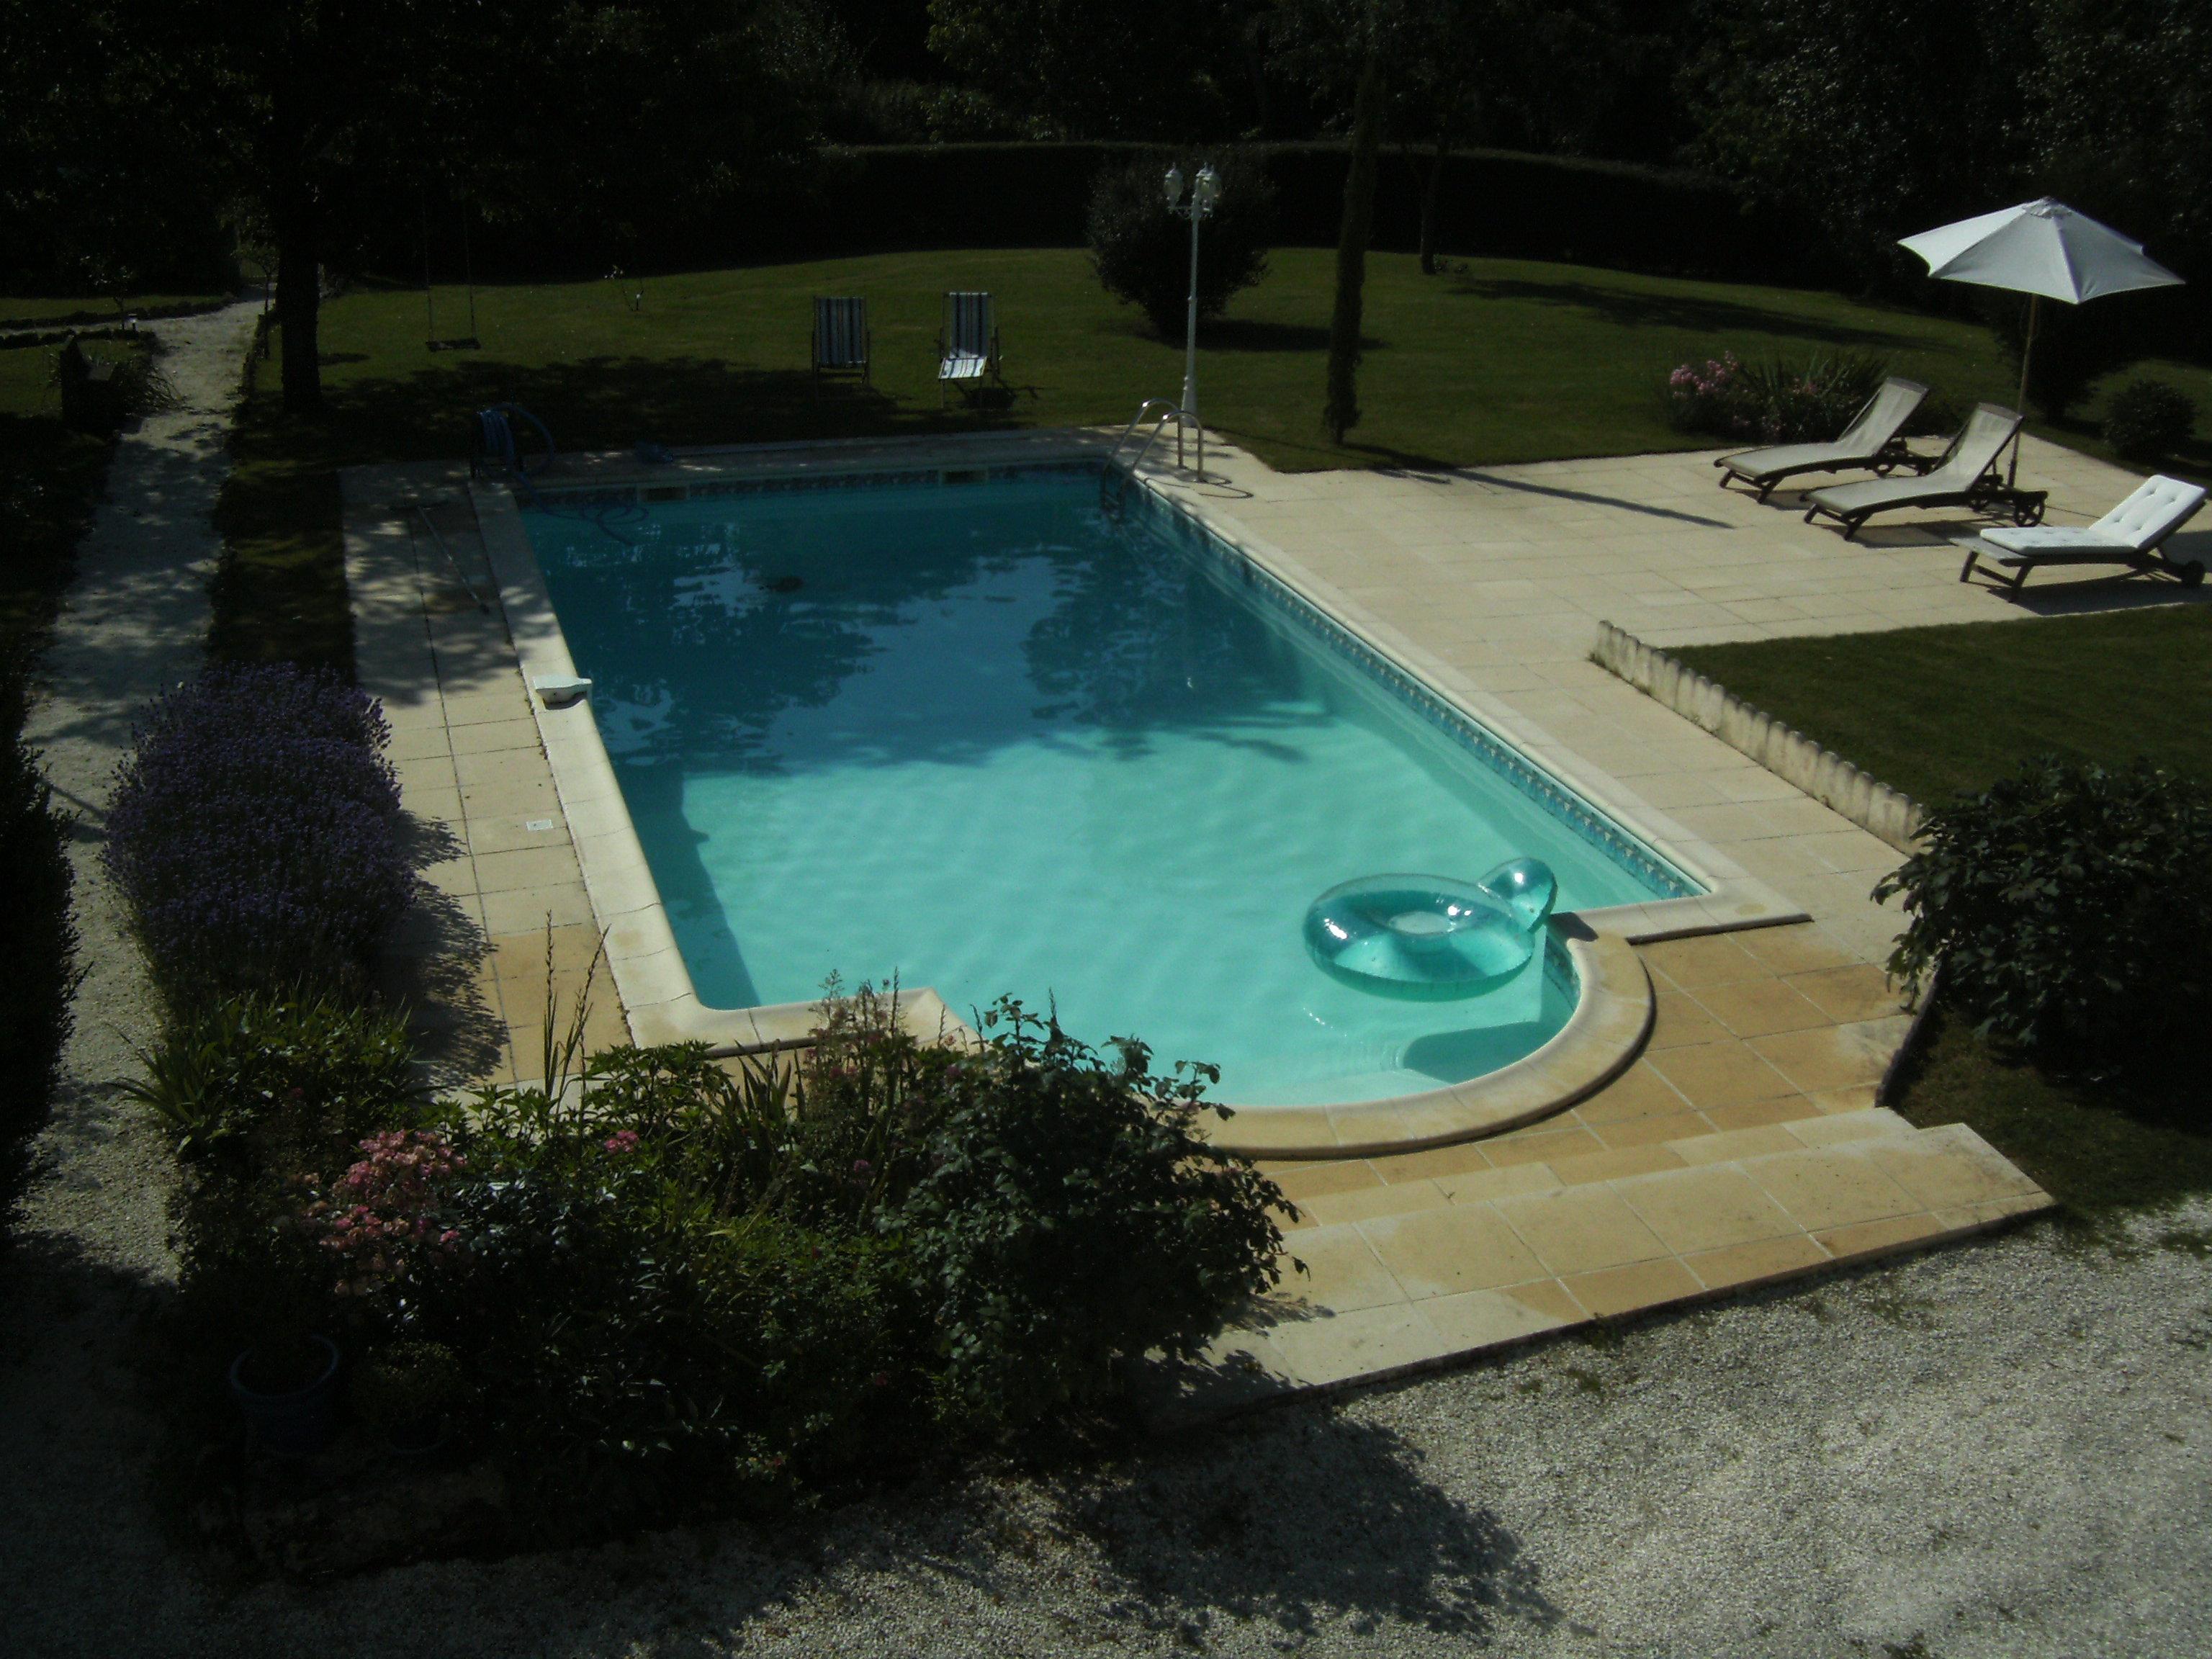 Chambre d 39 hotes royan avec piscine for Camping a royan avec piscine